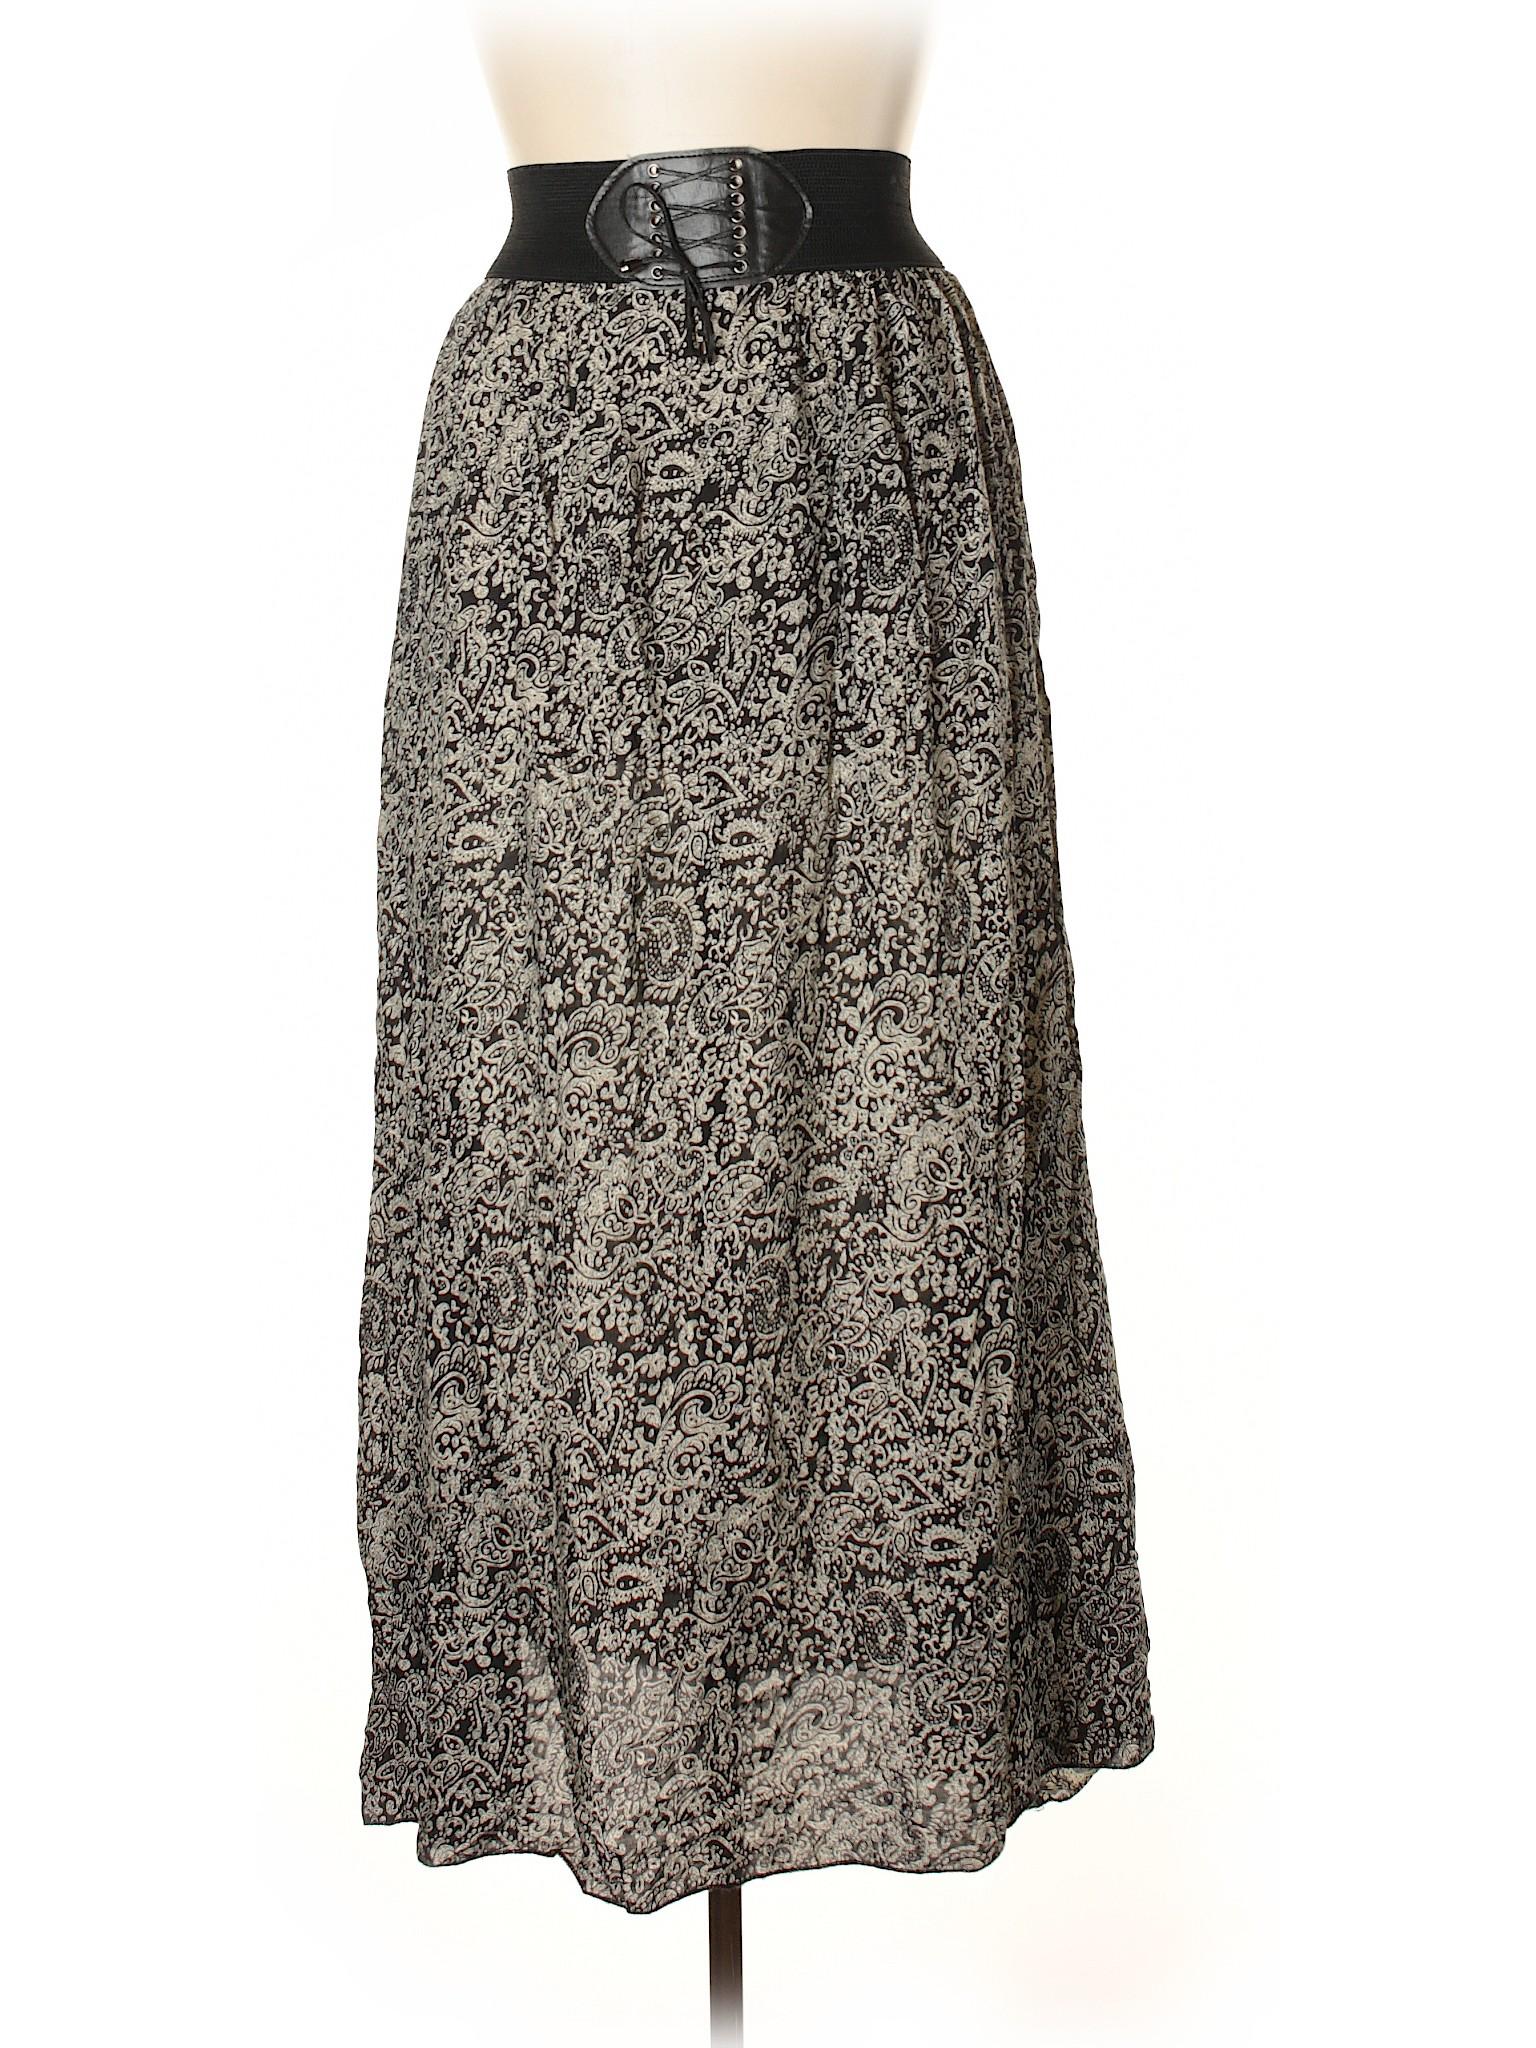 One 5 One Skirt Casual Boutique nHxwZEq